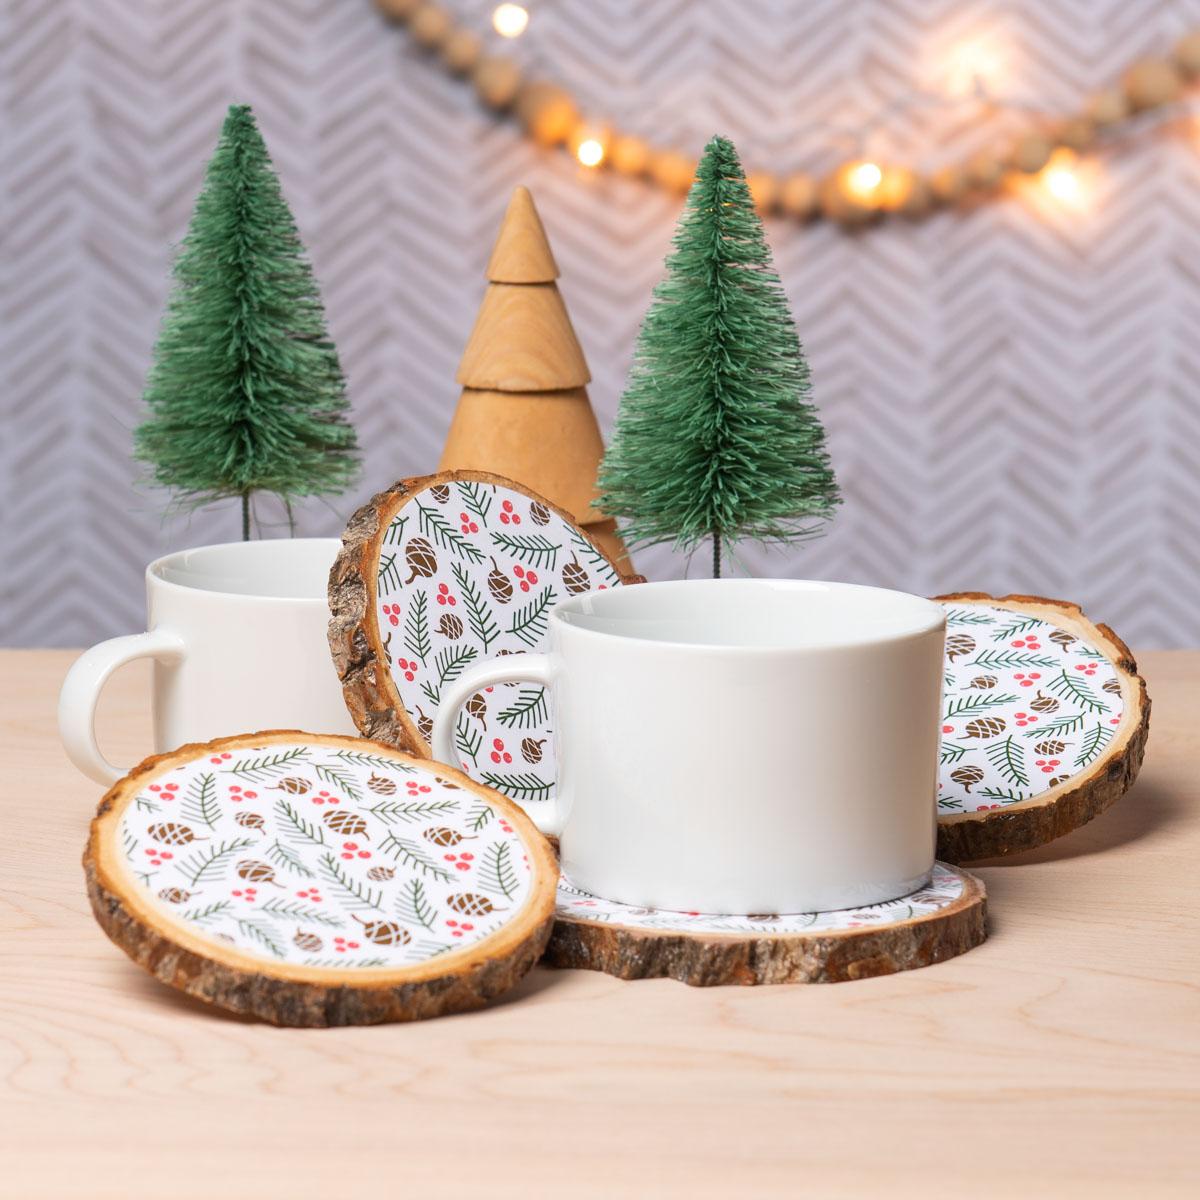 Mod Podge Patterned Coasters